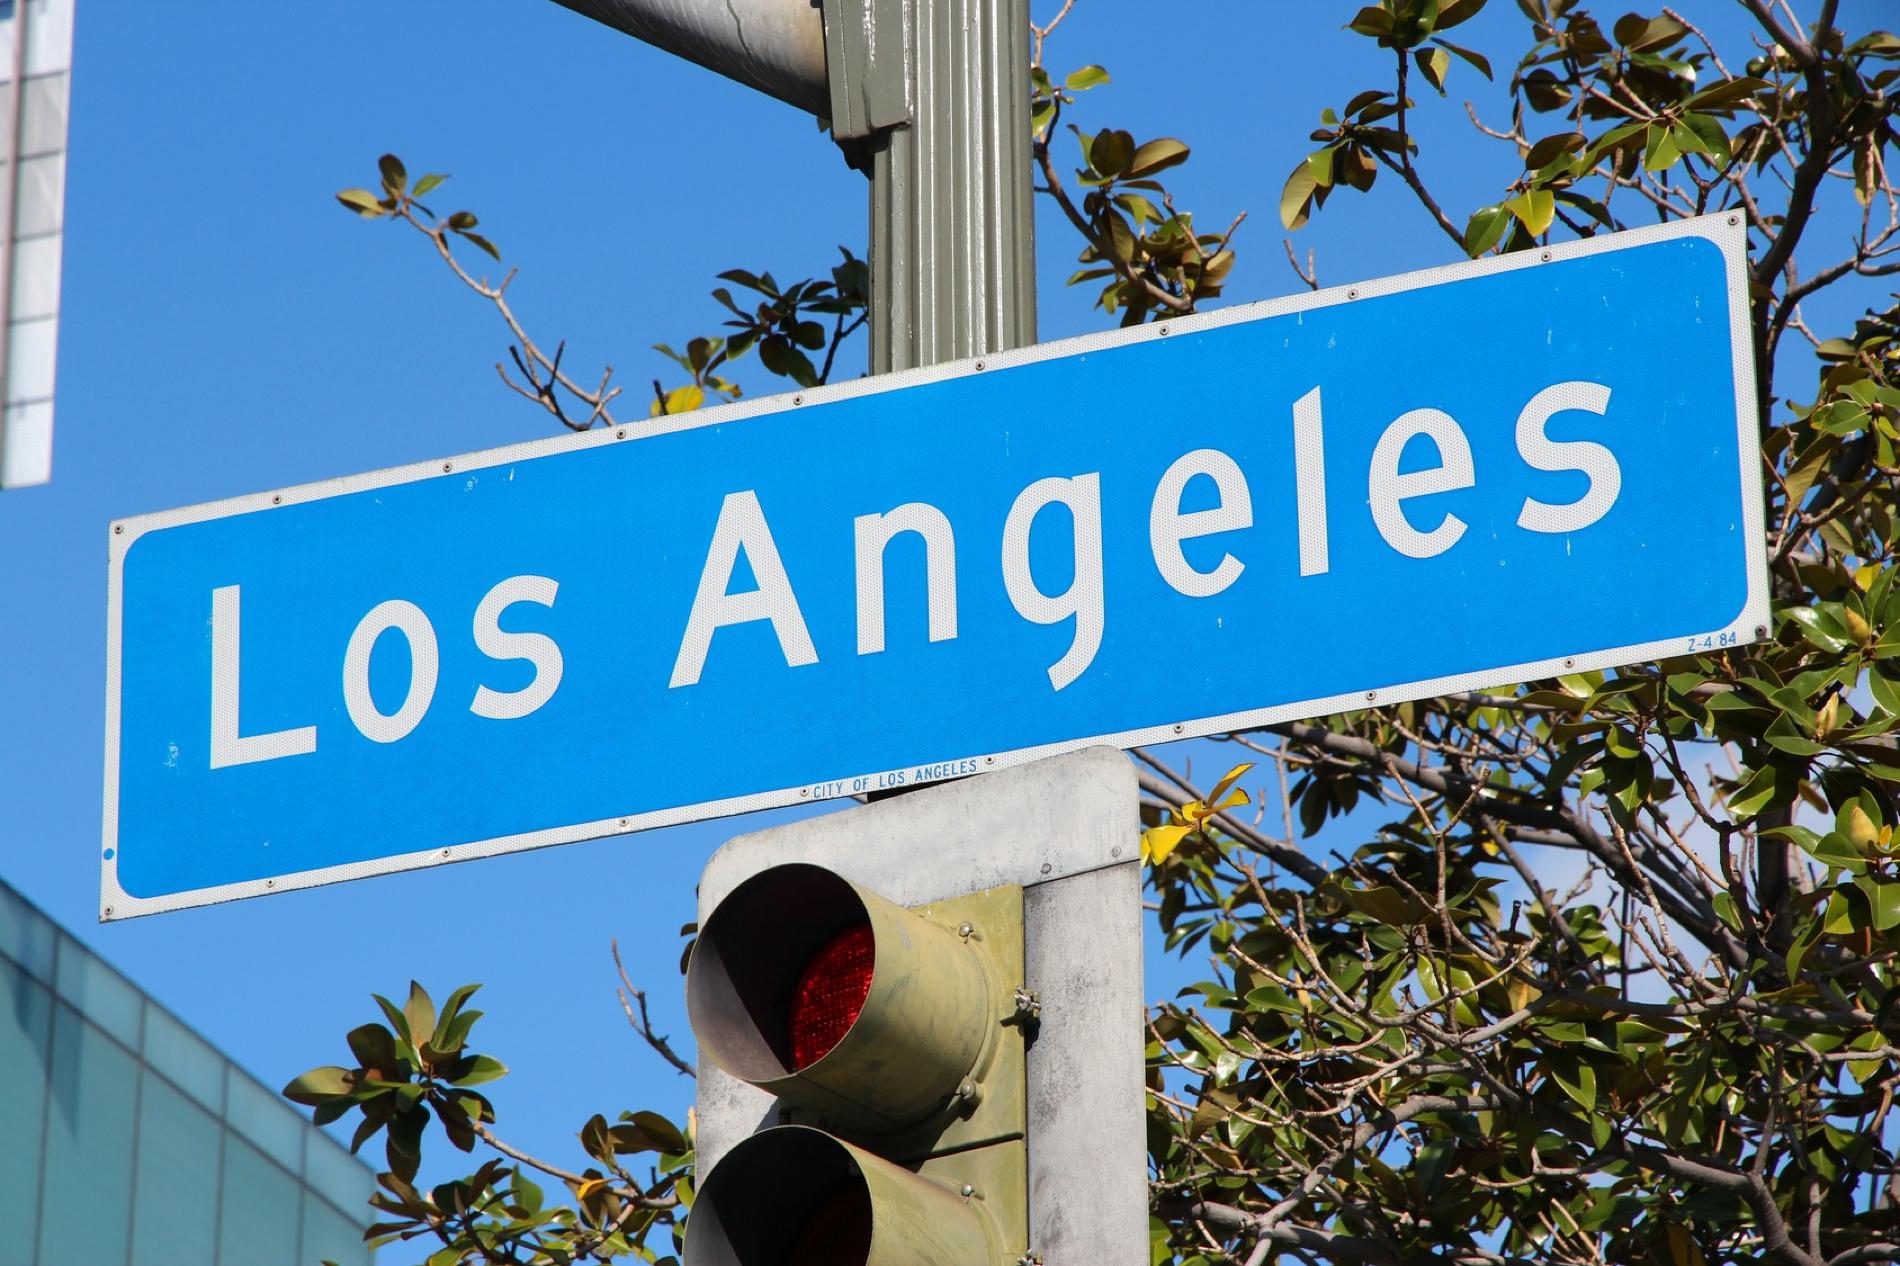 xl-los-angeles-sign.jpg